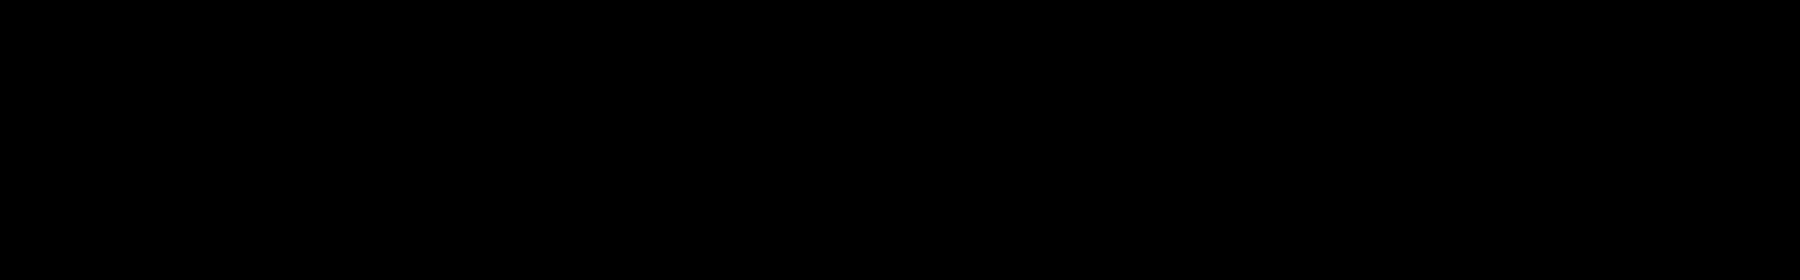 Rockstar 2 audio waveform